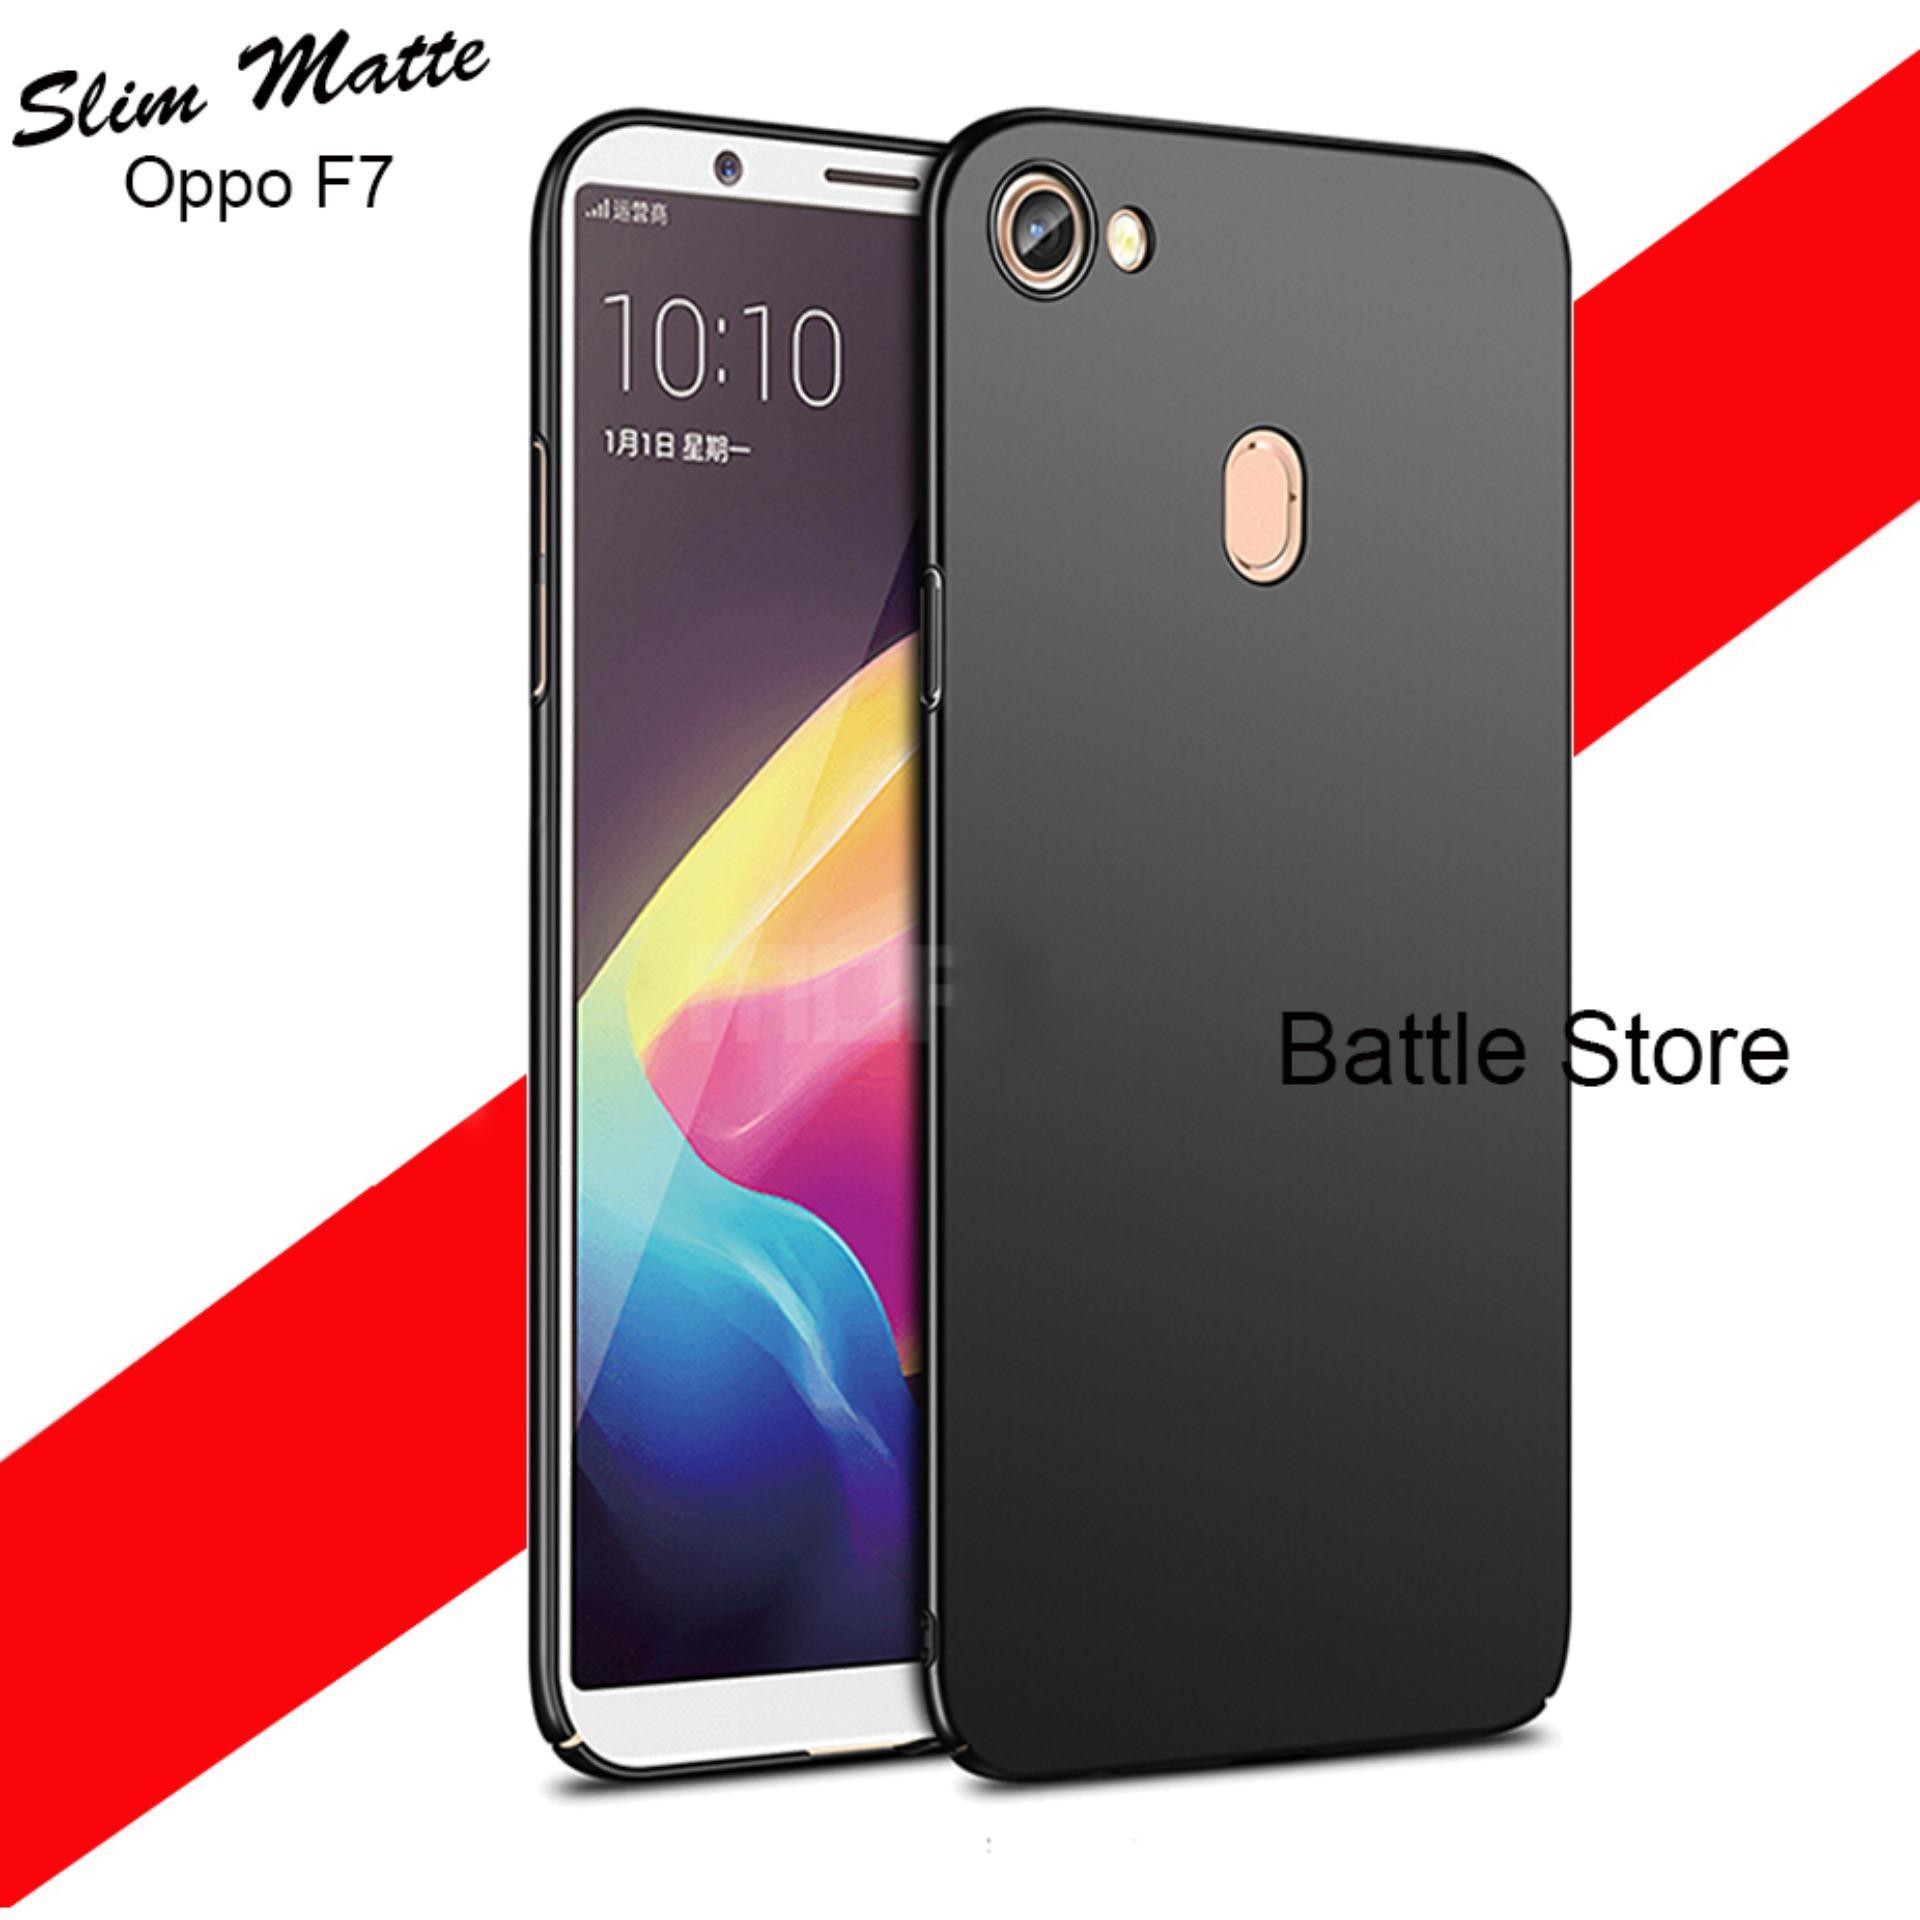 Case Slim Black Matte Oppo F7 Baby Skin Softcase Ultra Thin Jelly Silikon Babyskin - Black